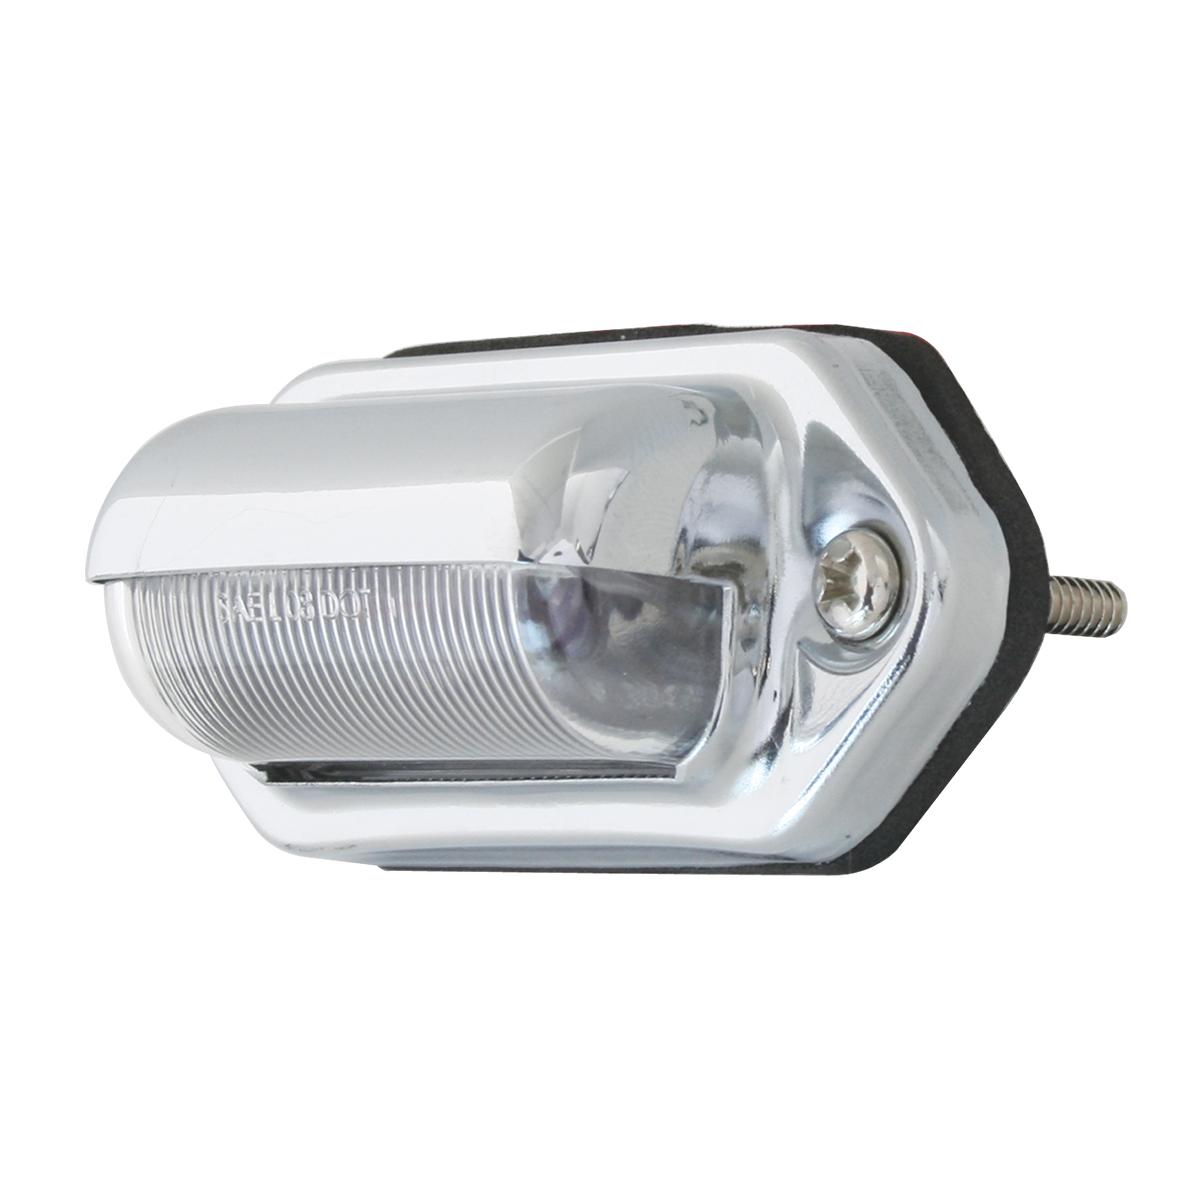 Interior/Utility LED Light, Unlit